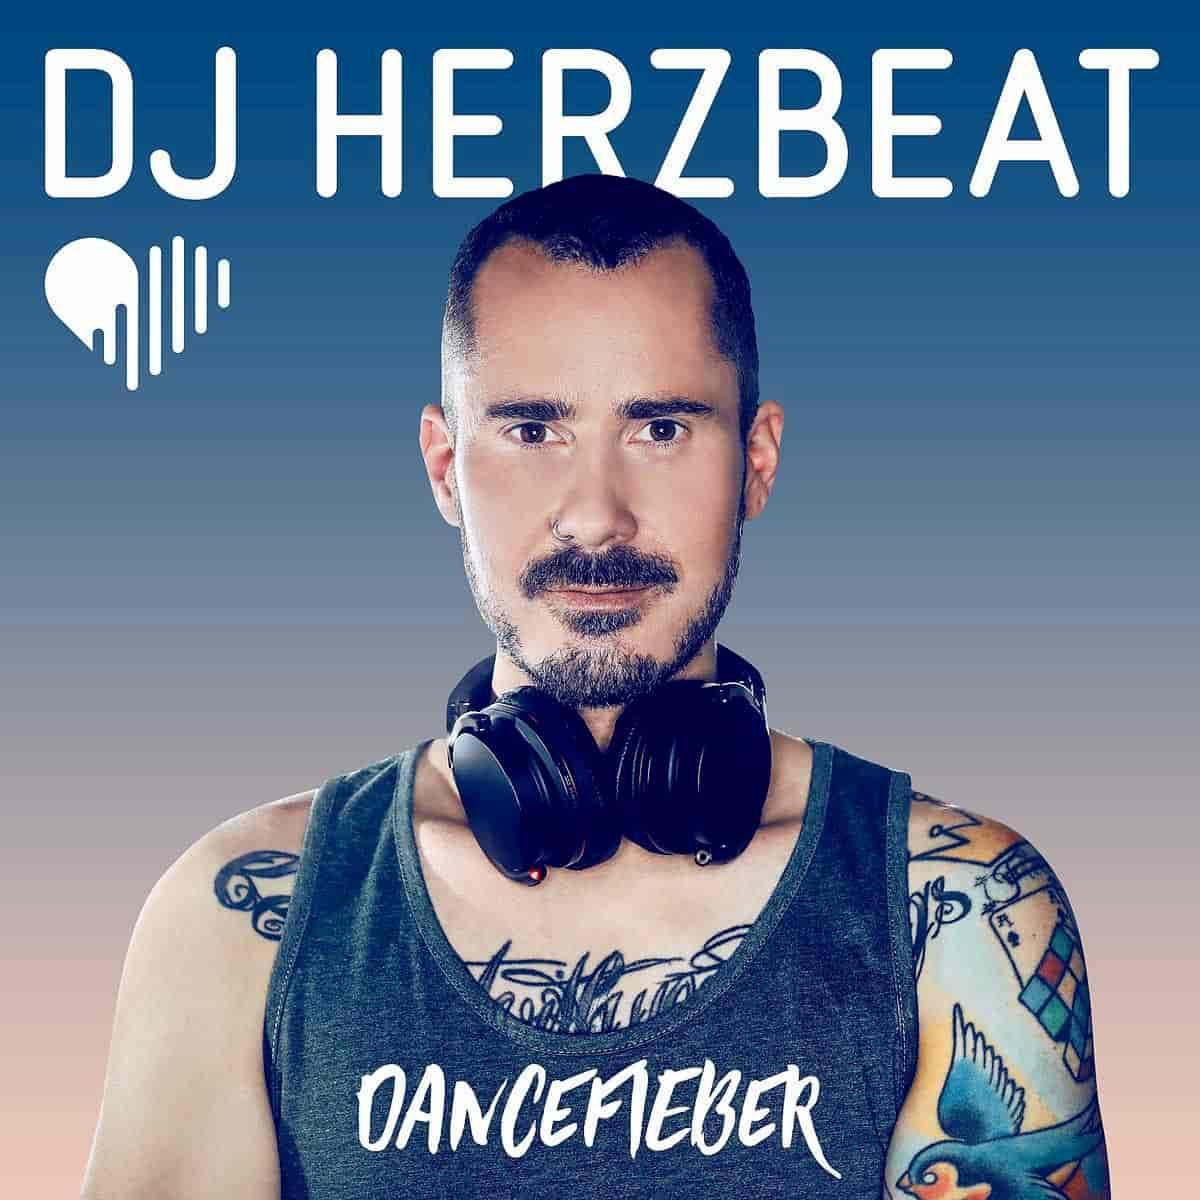 DJ Herzbeat - Schlager-CD Dancefieber